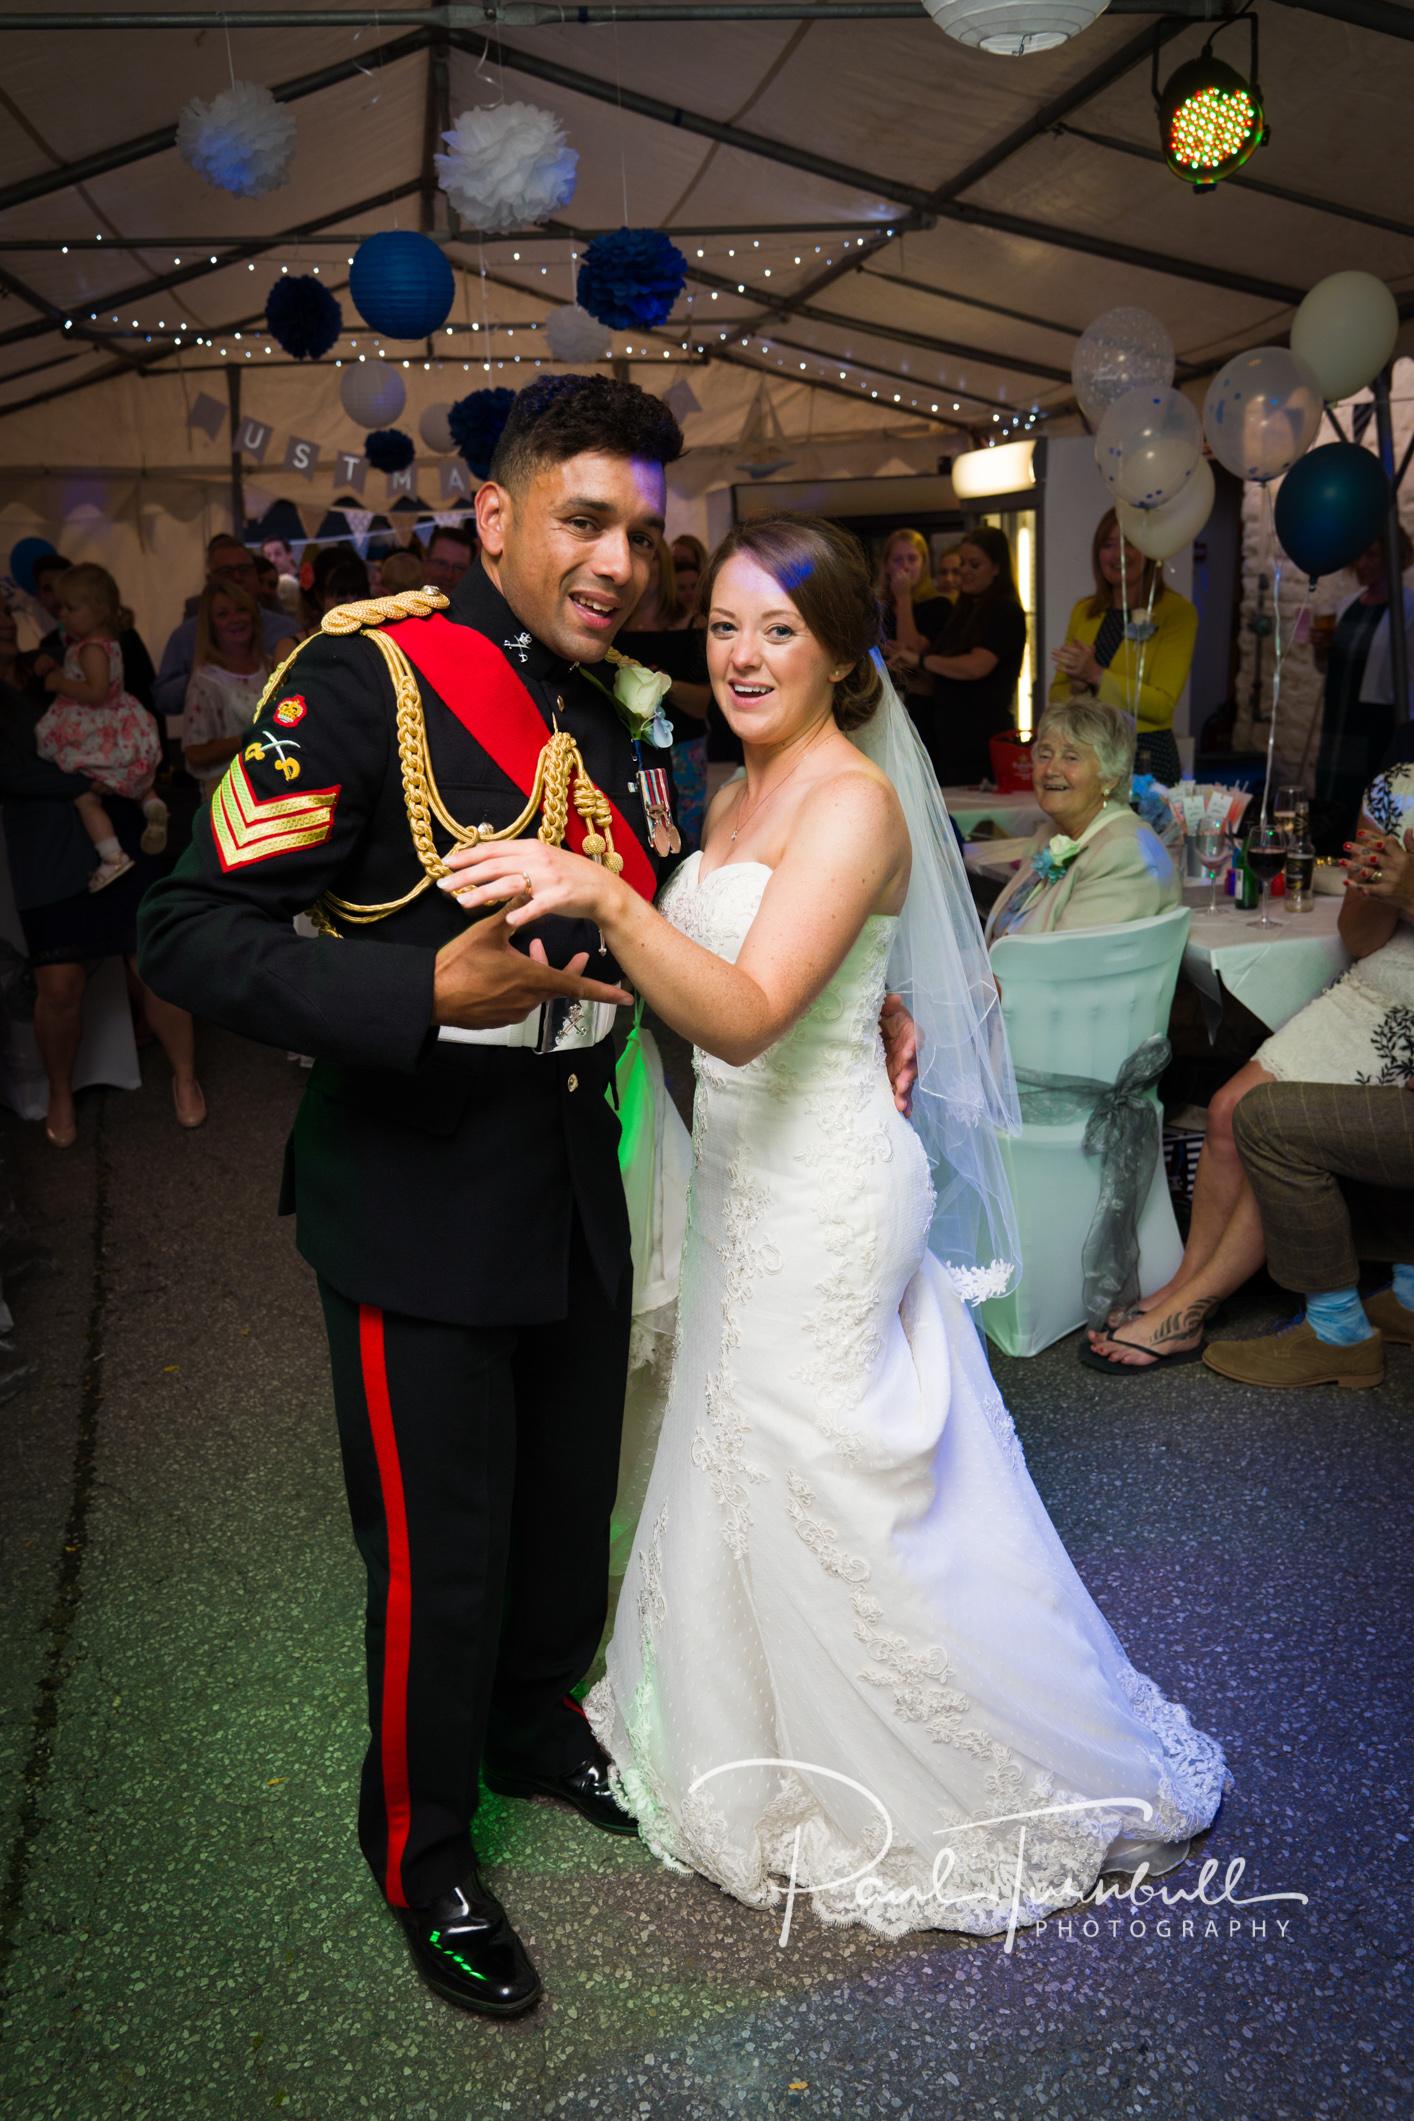 wedding-photographer-south-dalton-walkington-yorkshire-emma-james-080.jpg